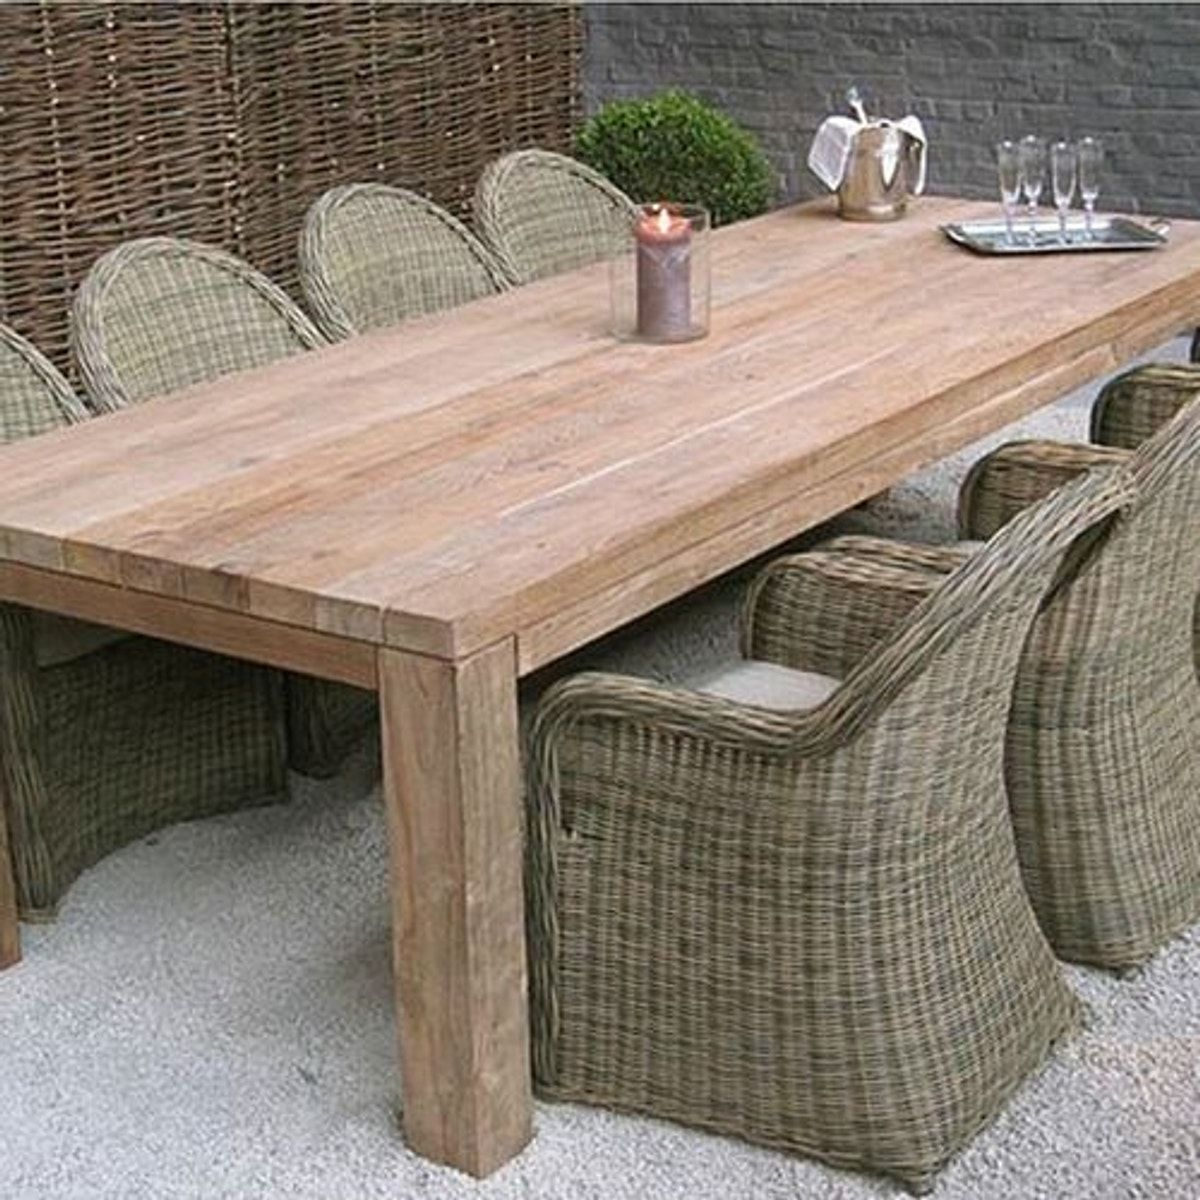 Table En Teck Recycle 300x110 Cm Callao Table Teck Table Exterieur Bois Table De Jardin